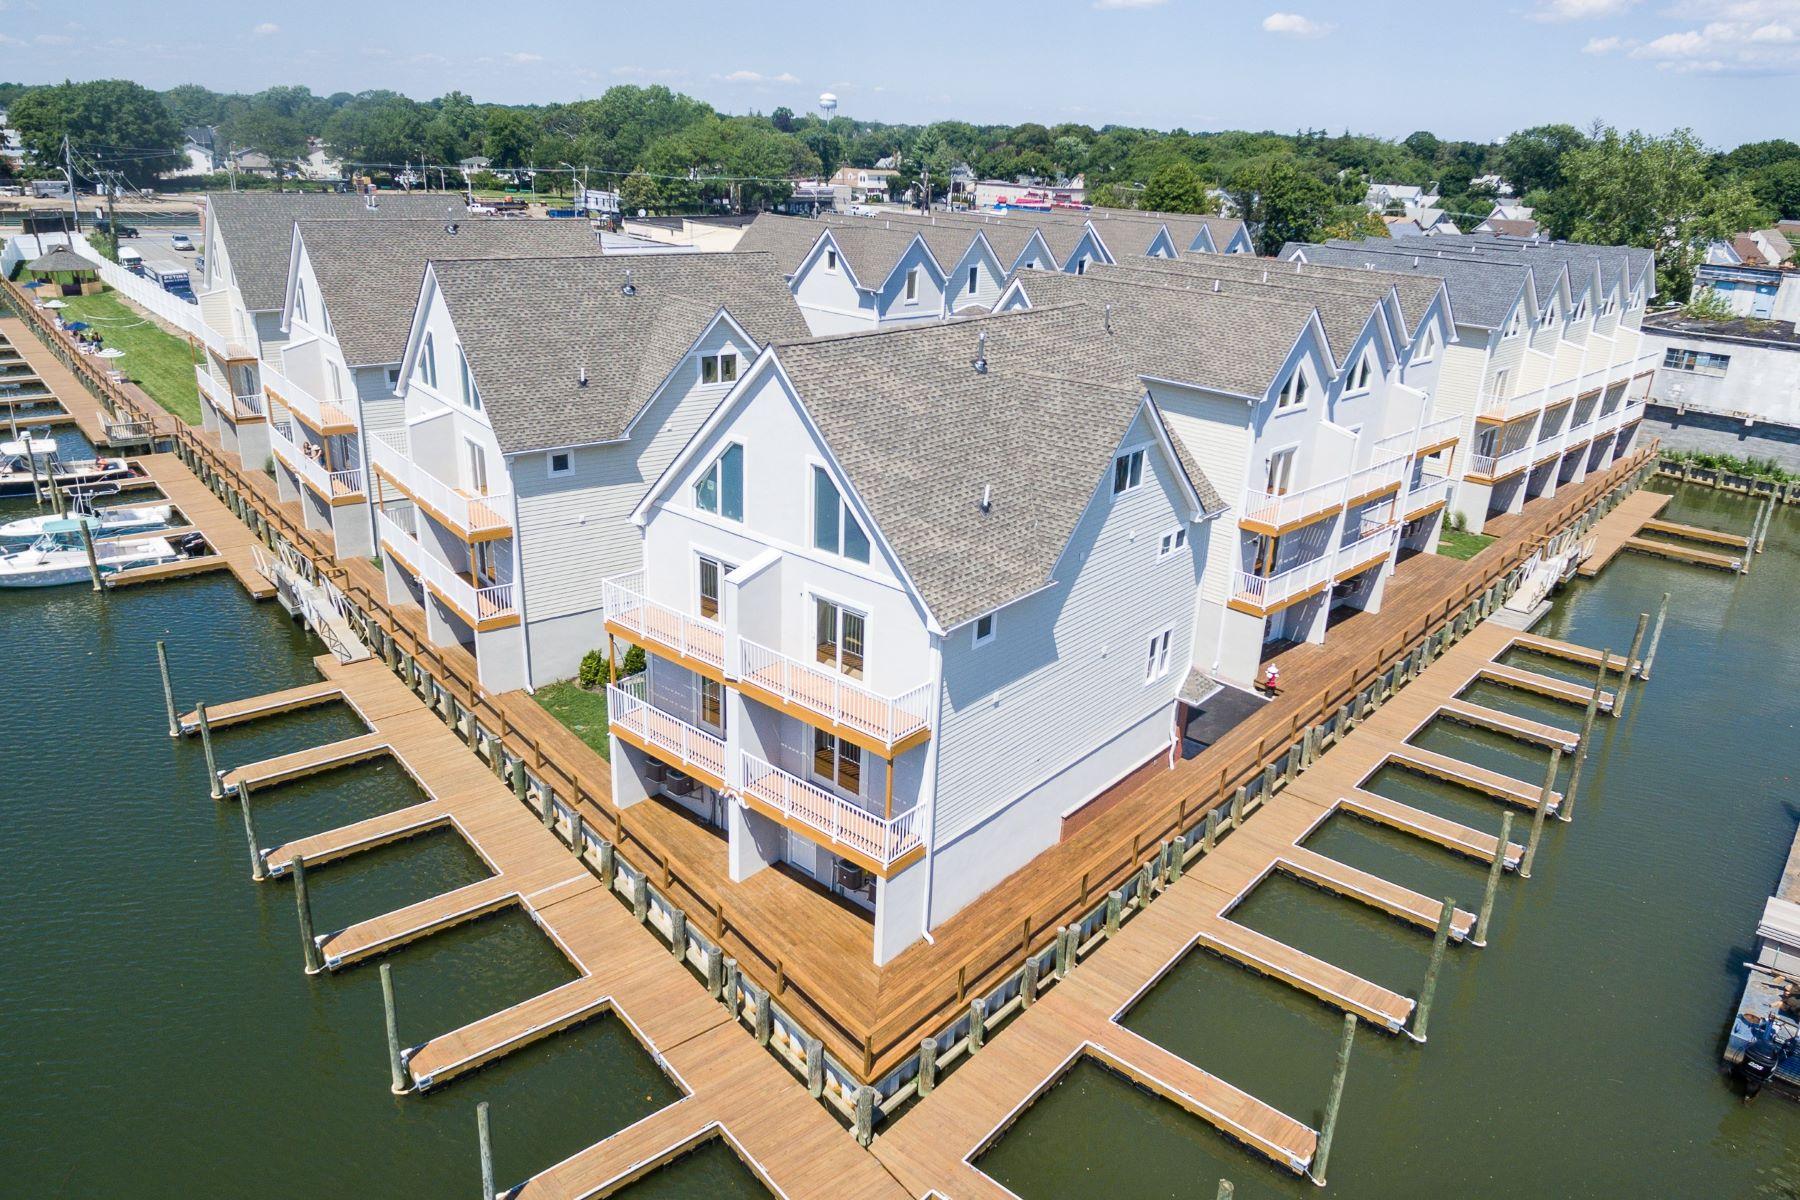 Condominium for Sale at Condo 531 Ray St 18 Freeport, New York 11520 United States